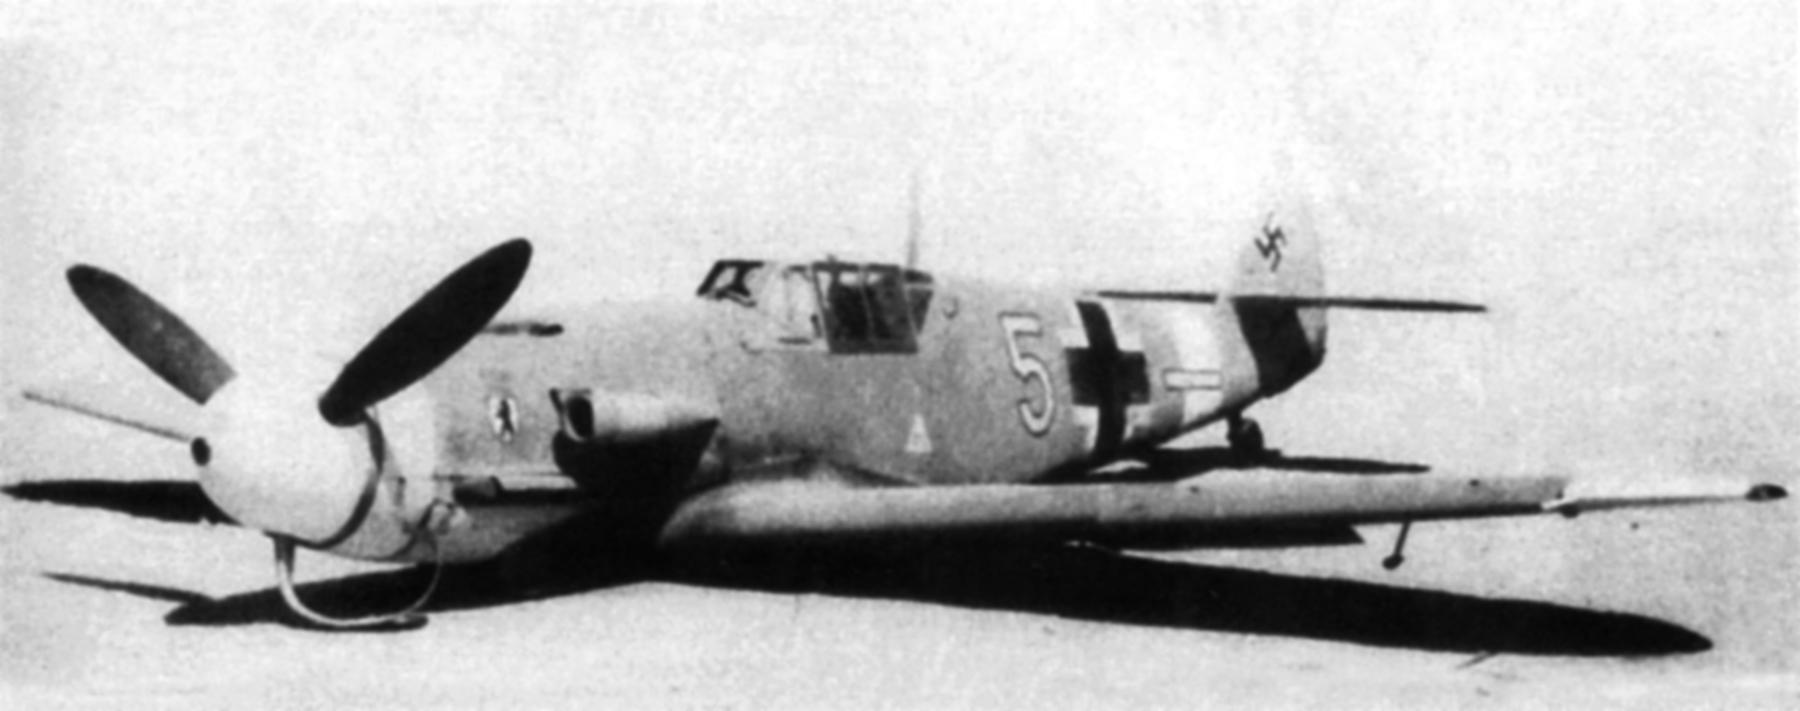 Messerschmitt Bf 109F4Trop 6.JG27 Yellow 5 Gehard Mix WNr 10074 crashed El Alamein Egypt Aug 14 1942 01